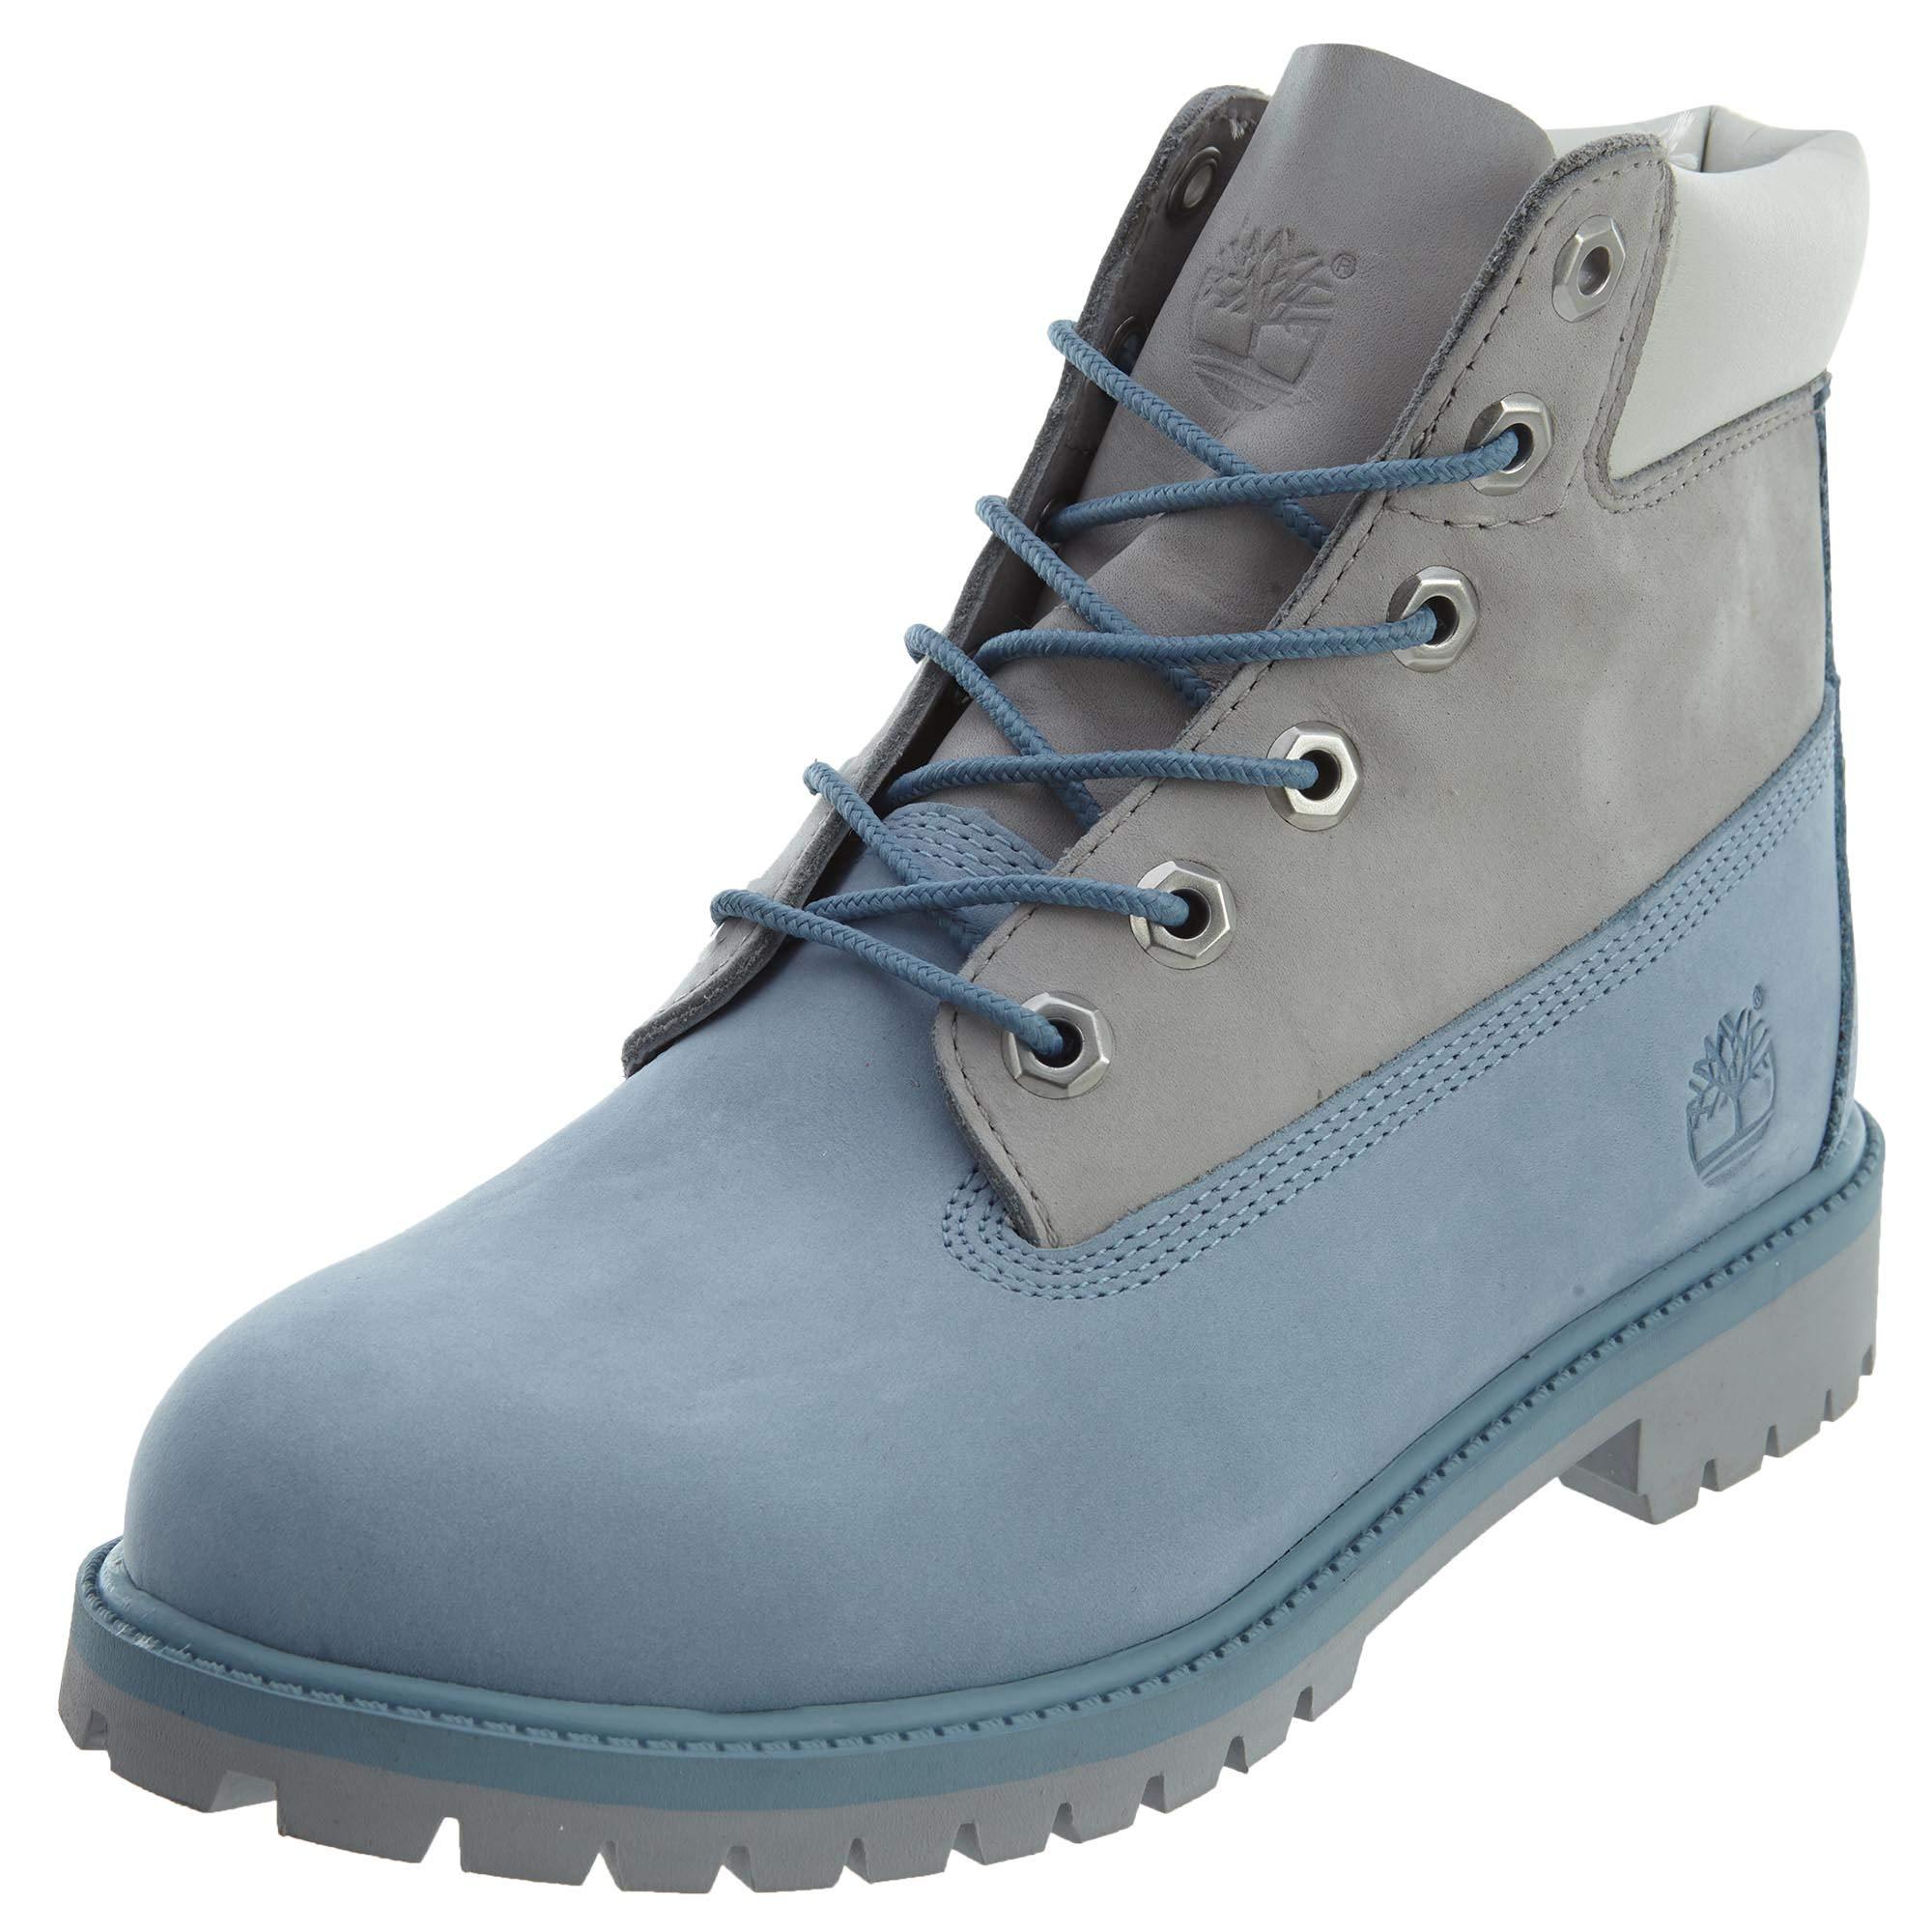 Timberland Big Kids 6 in. Classic Premium Boots (6 D(M) US, Blue/Grey)